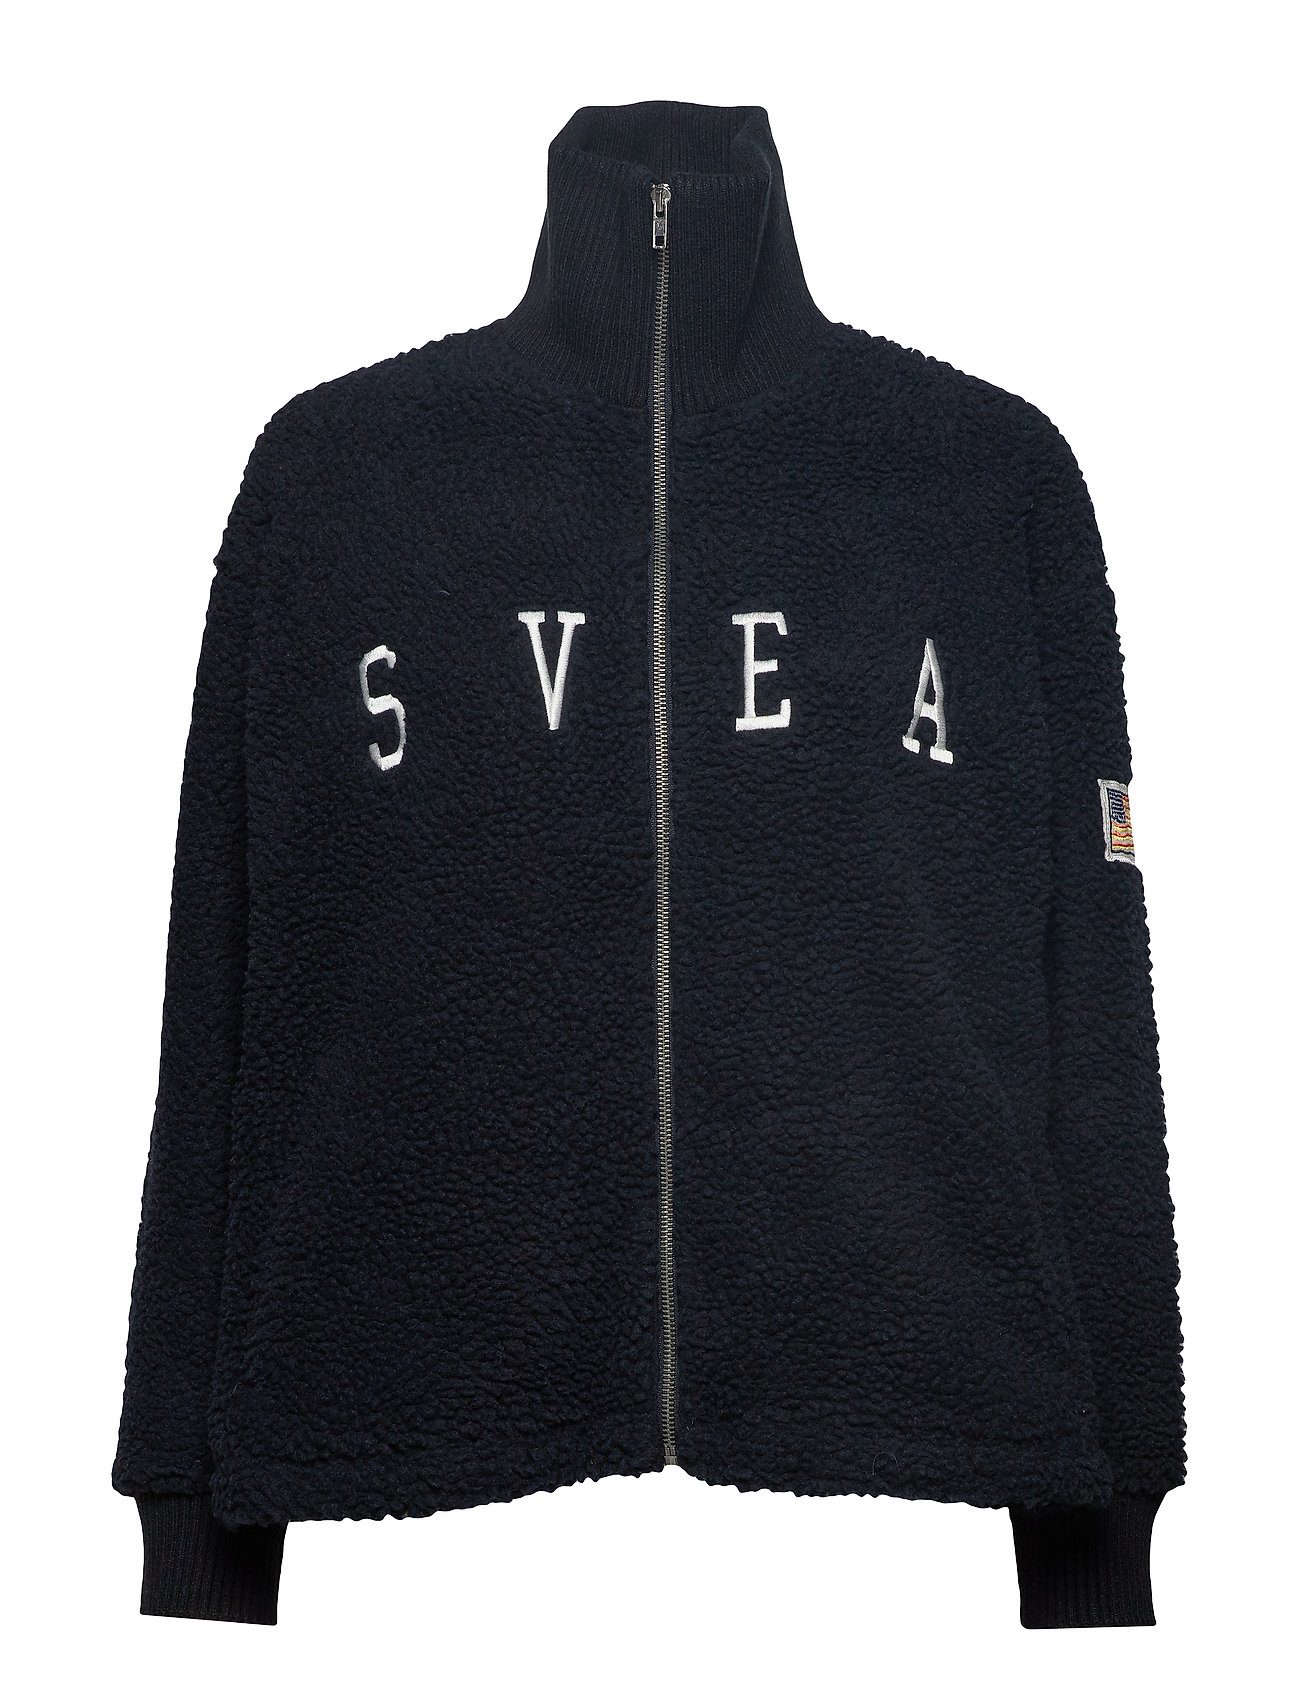 Svea Kathryn Pile Zip Sweater - DARK NAVY